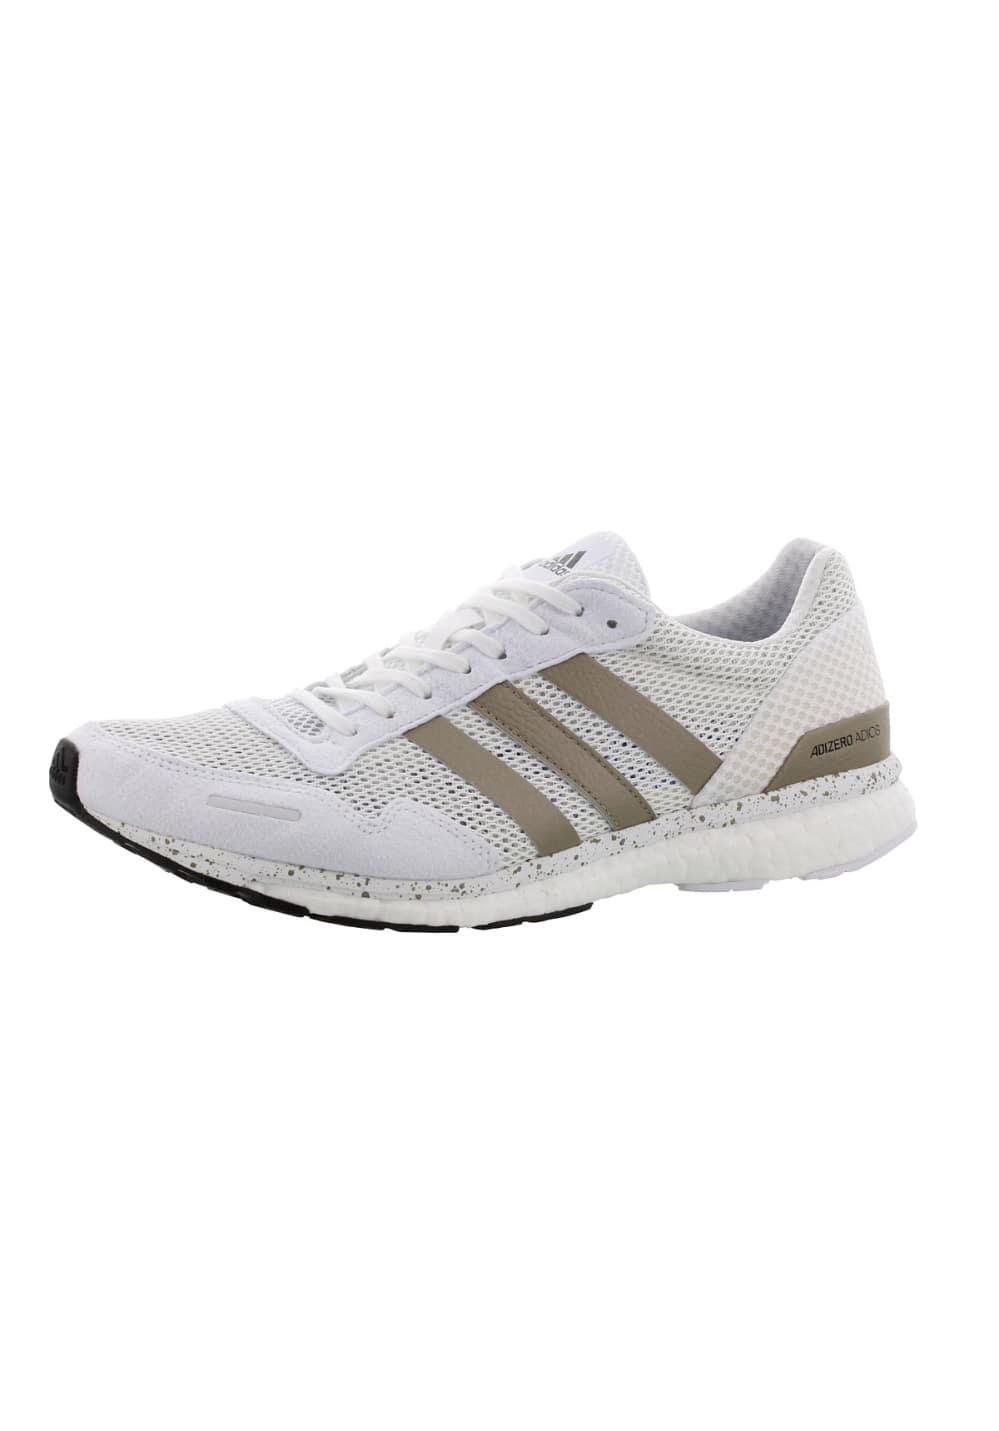 new product 06aa1 9e11e adidas adiZero Adios - Running shoes for Men - White